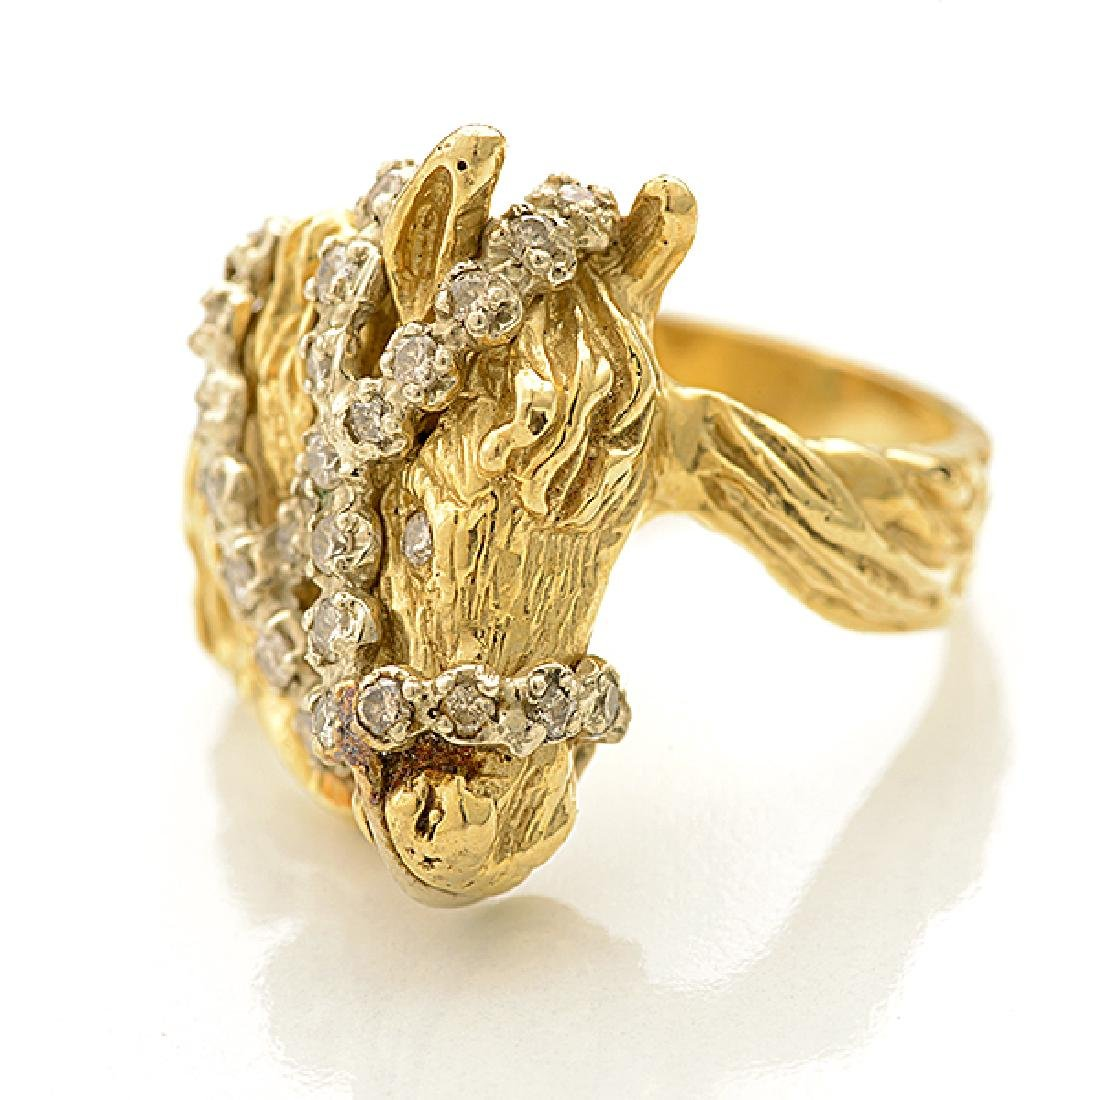 Diamond, 14k Yellow Gold Horse Ring. - 2